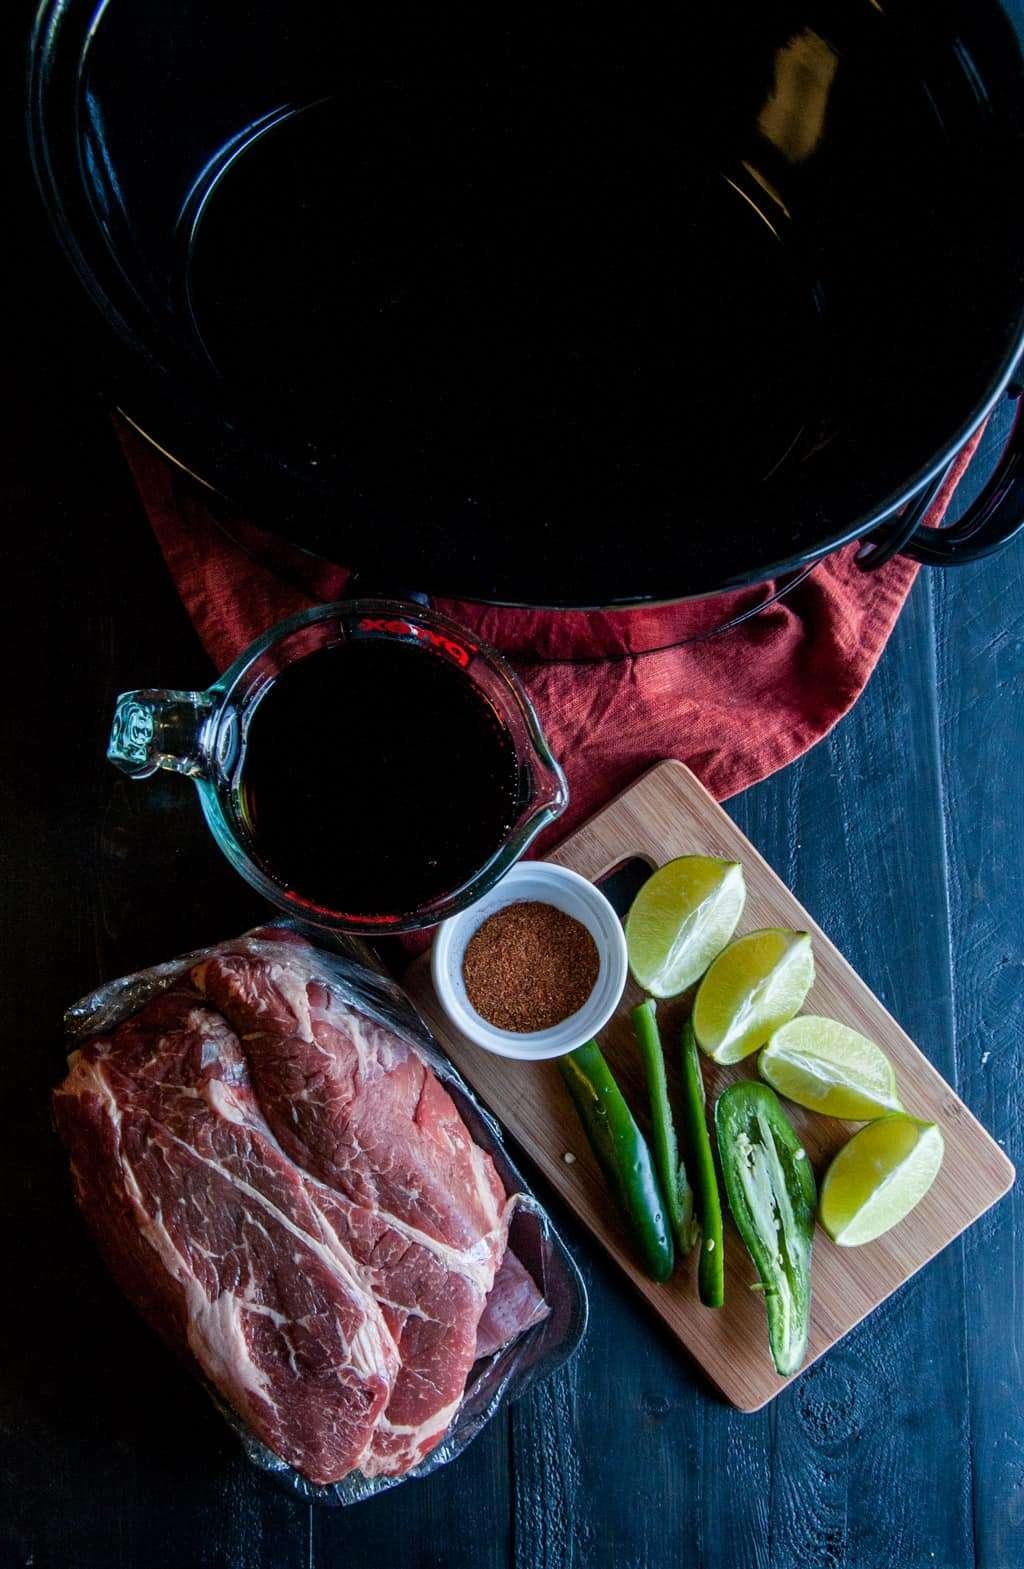 Crock pot 5 ingredient Mexican beef ingredients from @sweetphi